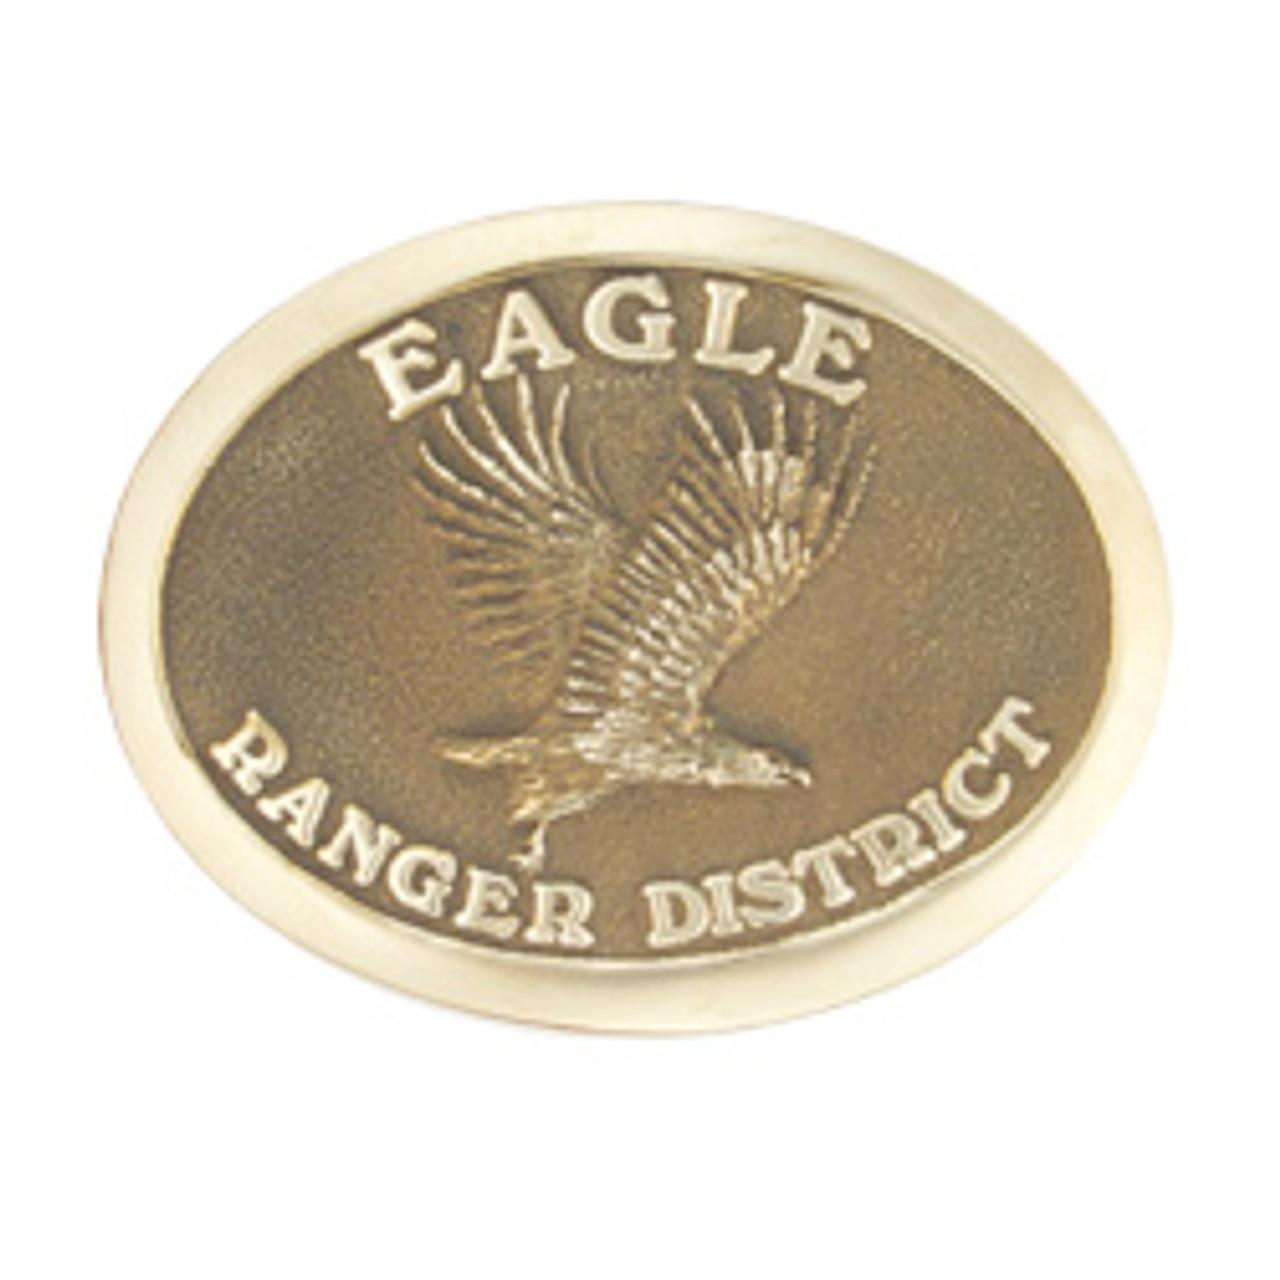 Eagle Ranger District Buckle